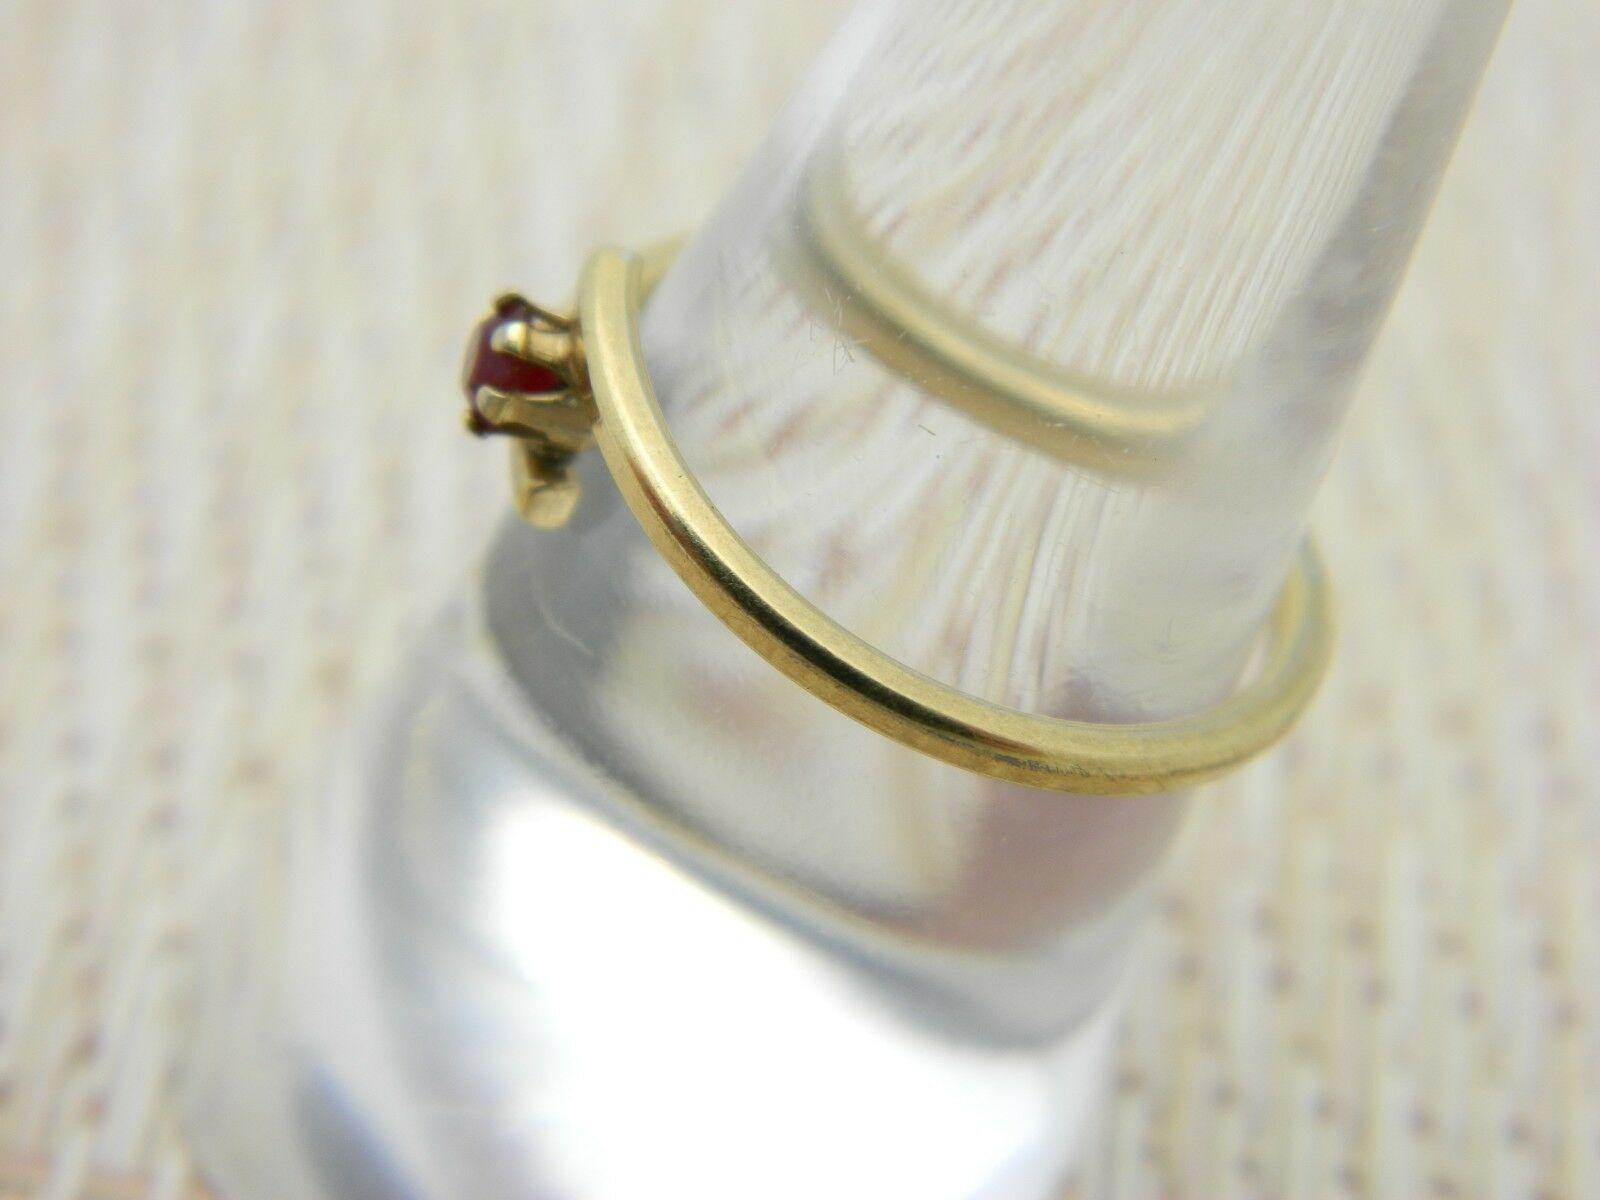 AVON Gold Tone Red Rhinestone Dainty Ring Adjustable Size 7.25 Vintage image 3